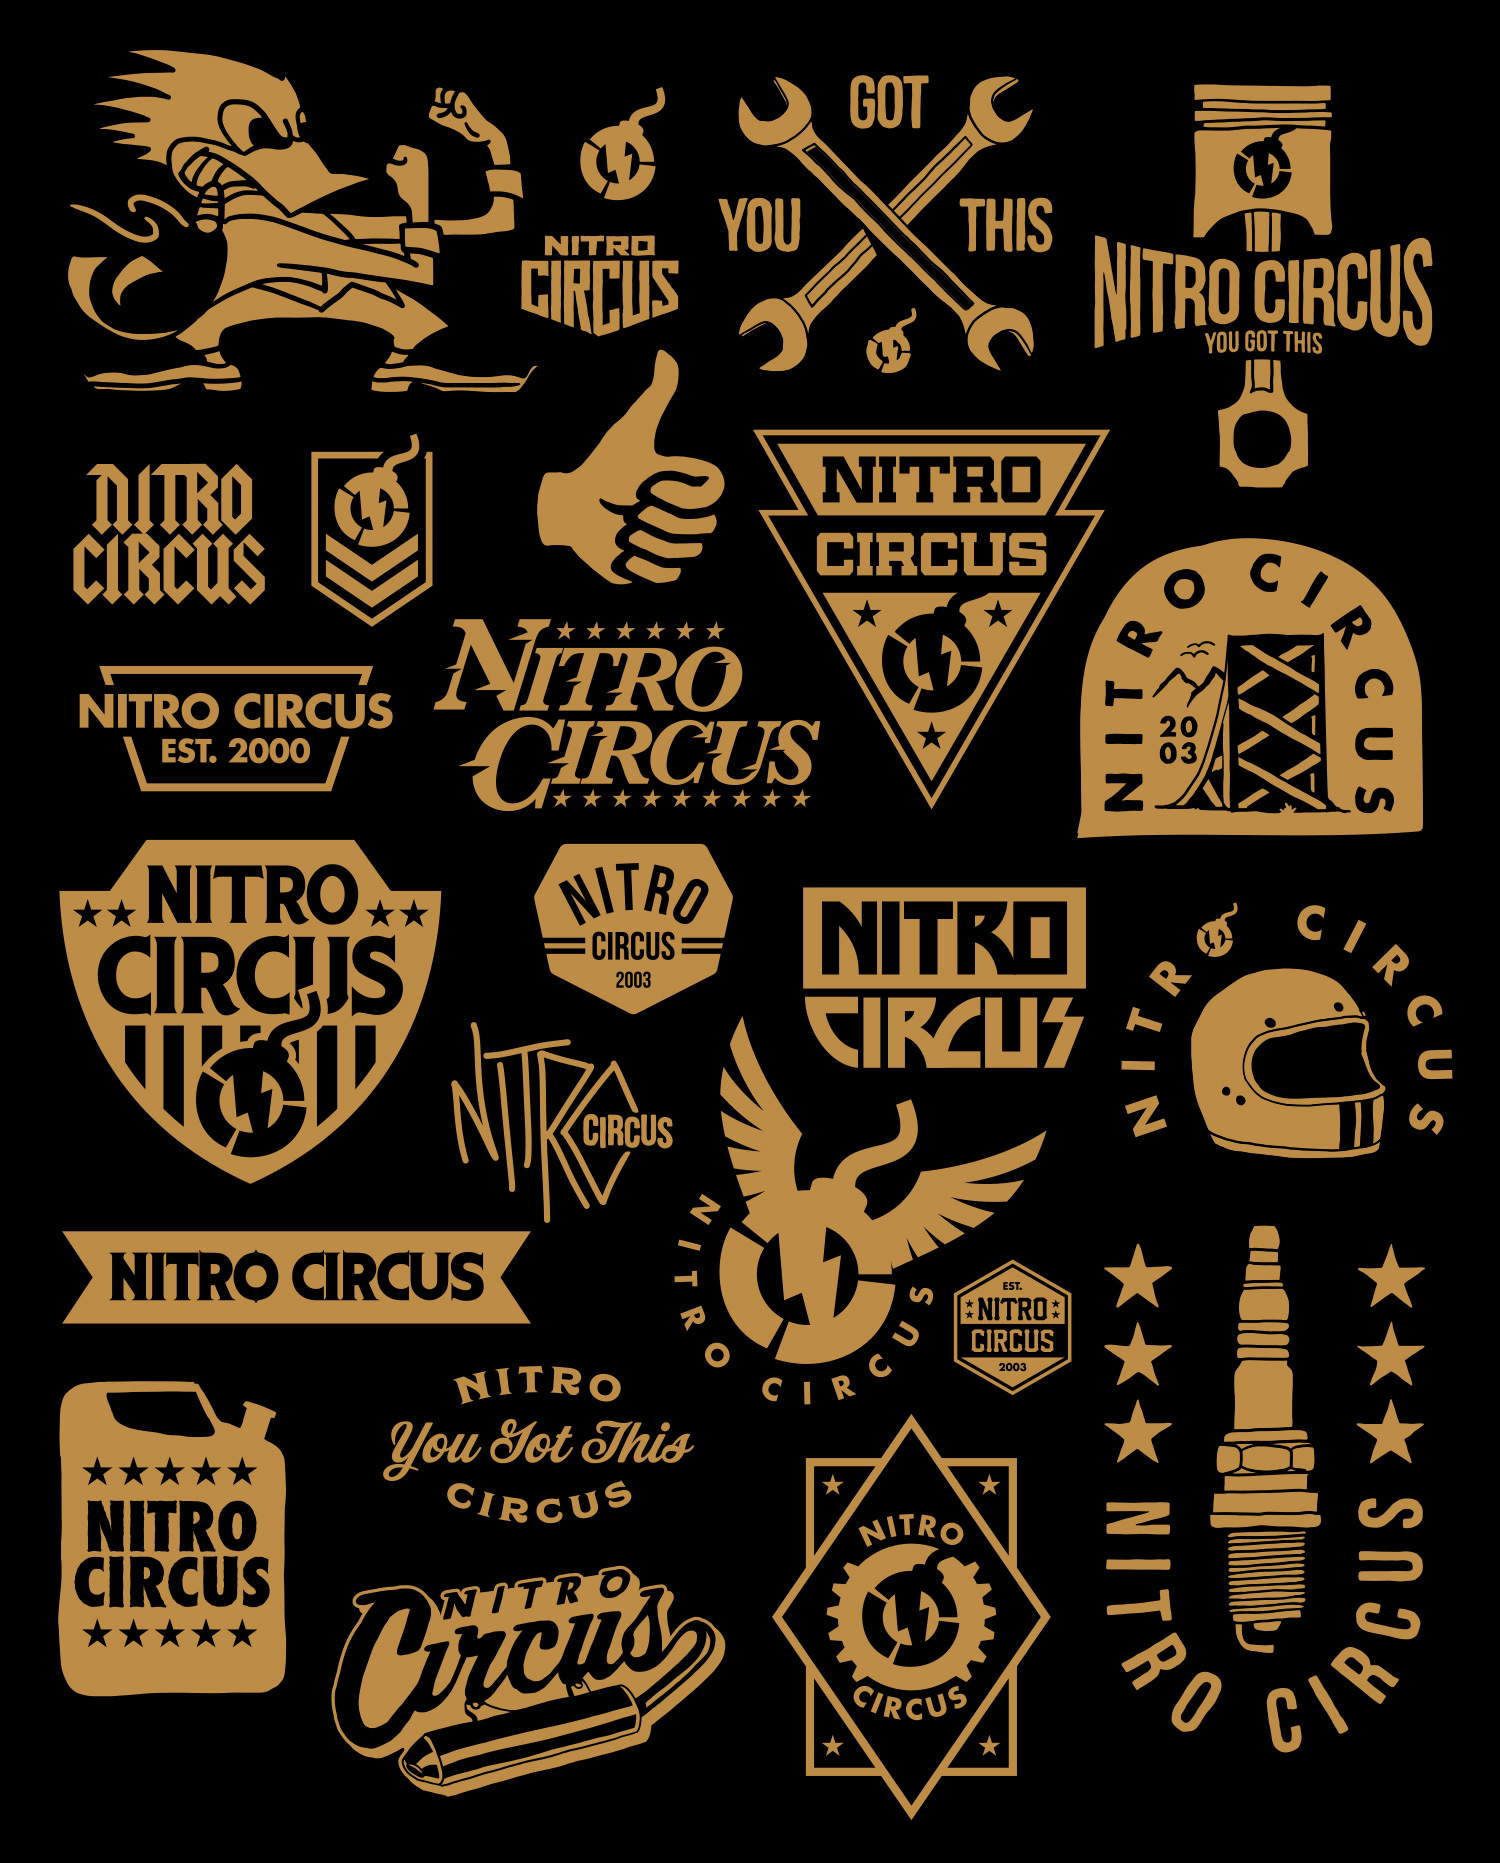 nitro_badge3.jpg